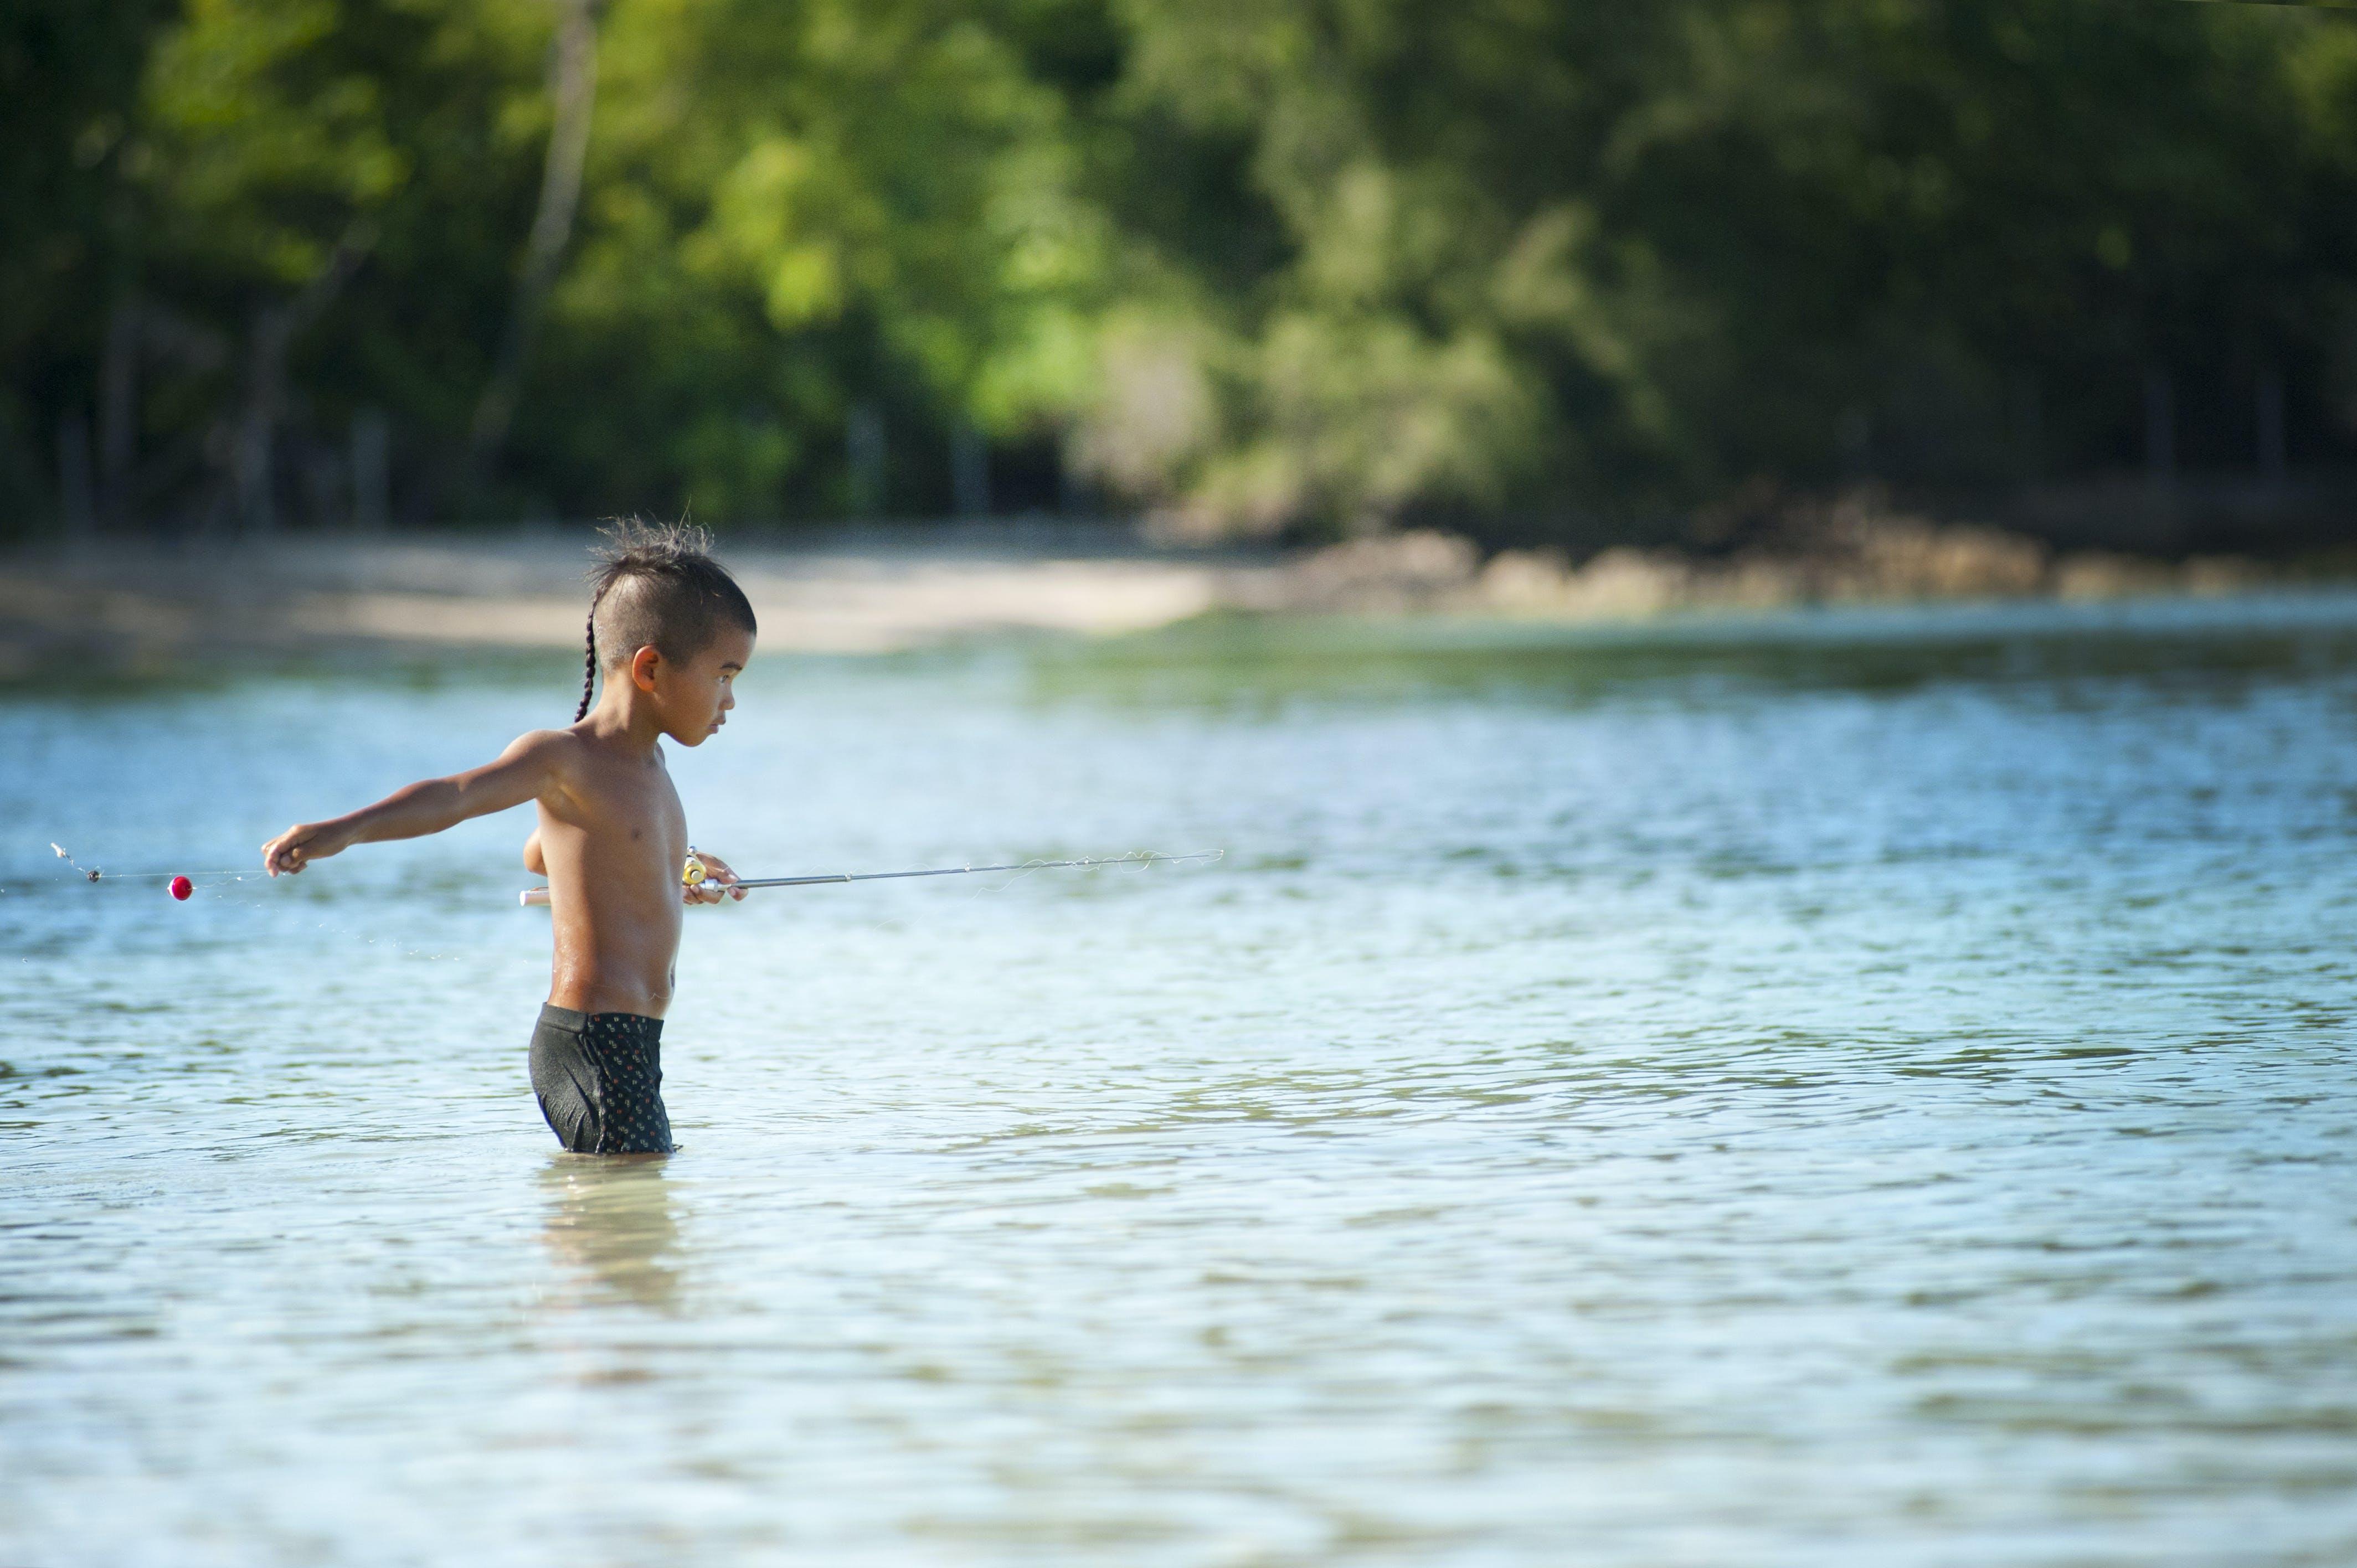 Kostenloses Stock Foto zu action, asiatischer junge, asiatisches kind, bewegung